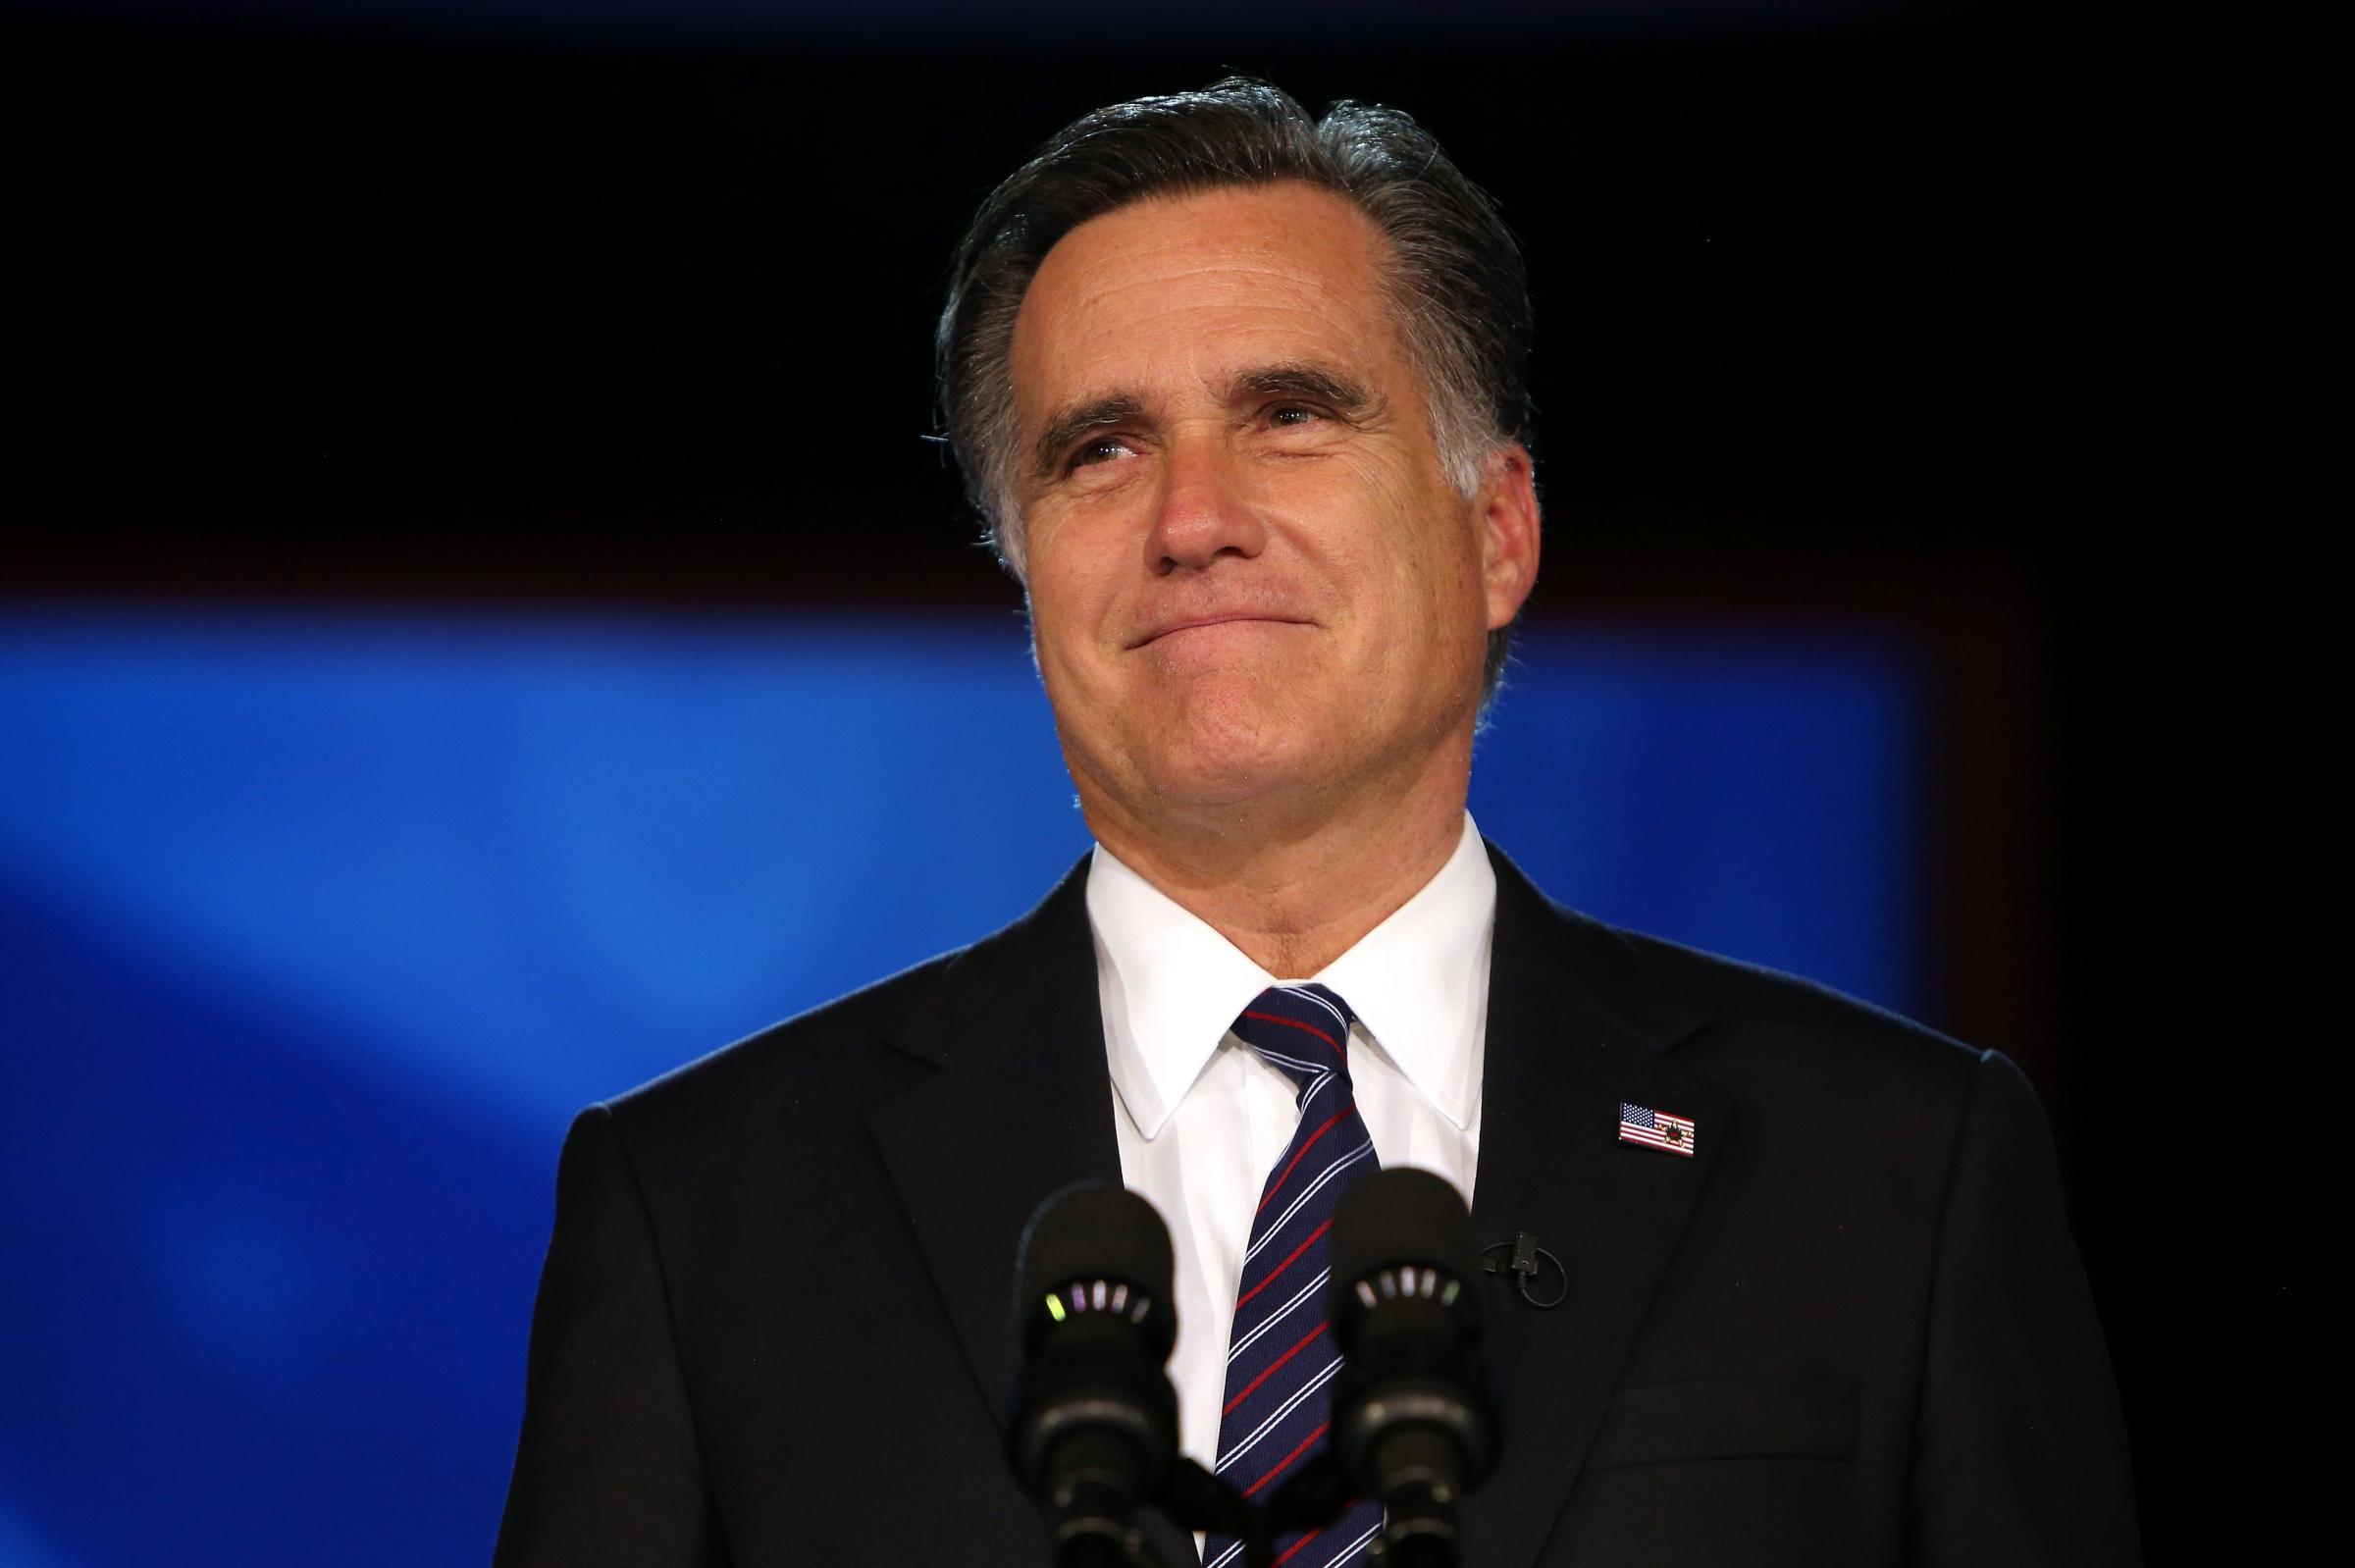 Excerpts from Mitt Romney's convention speech